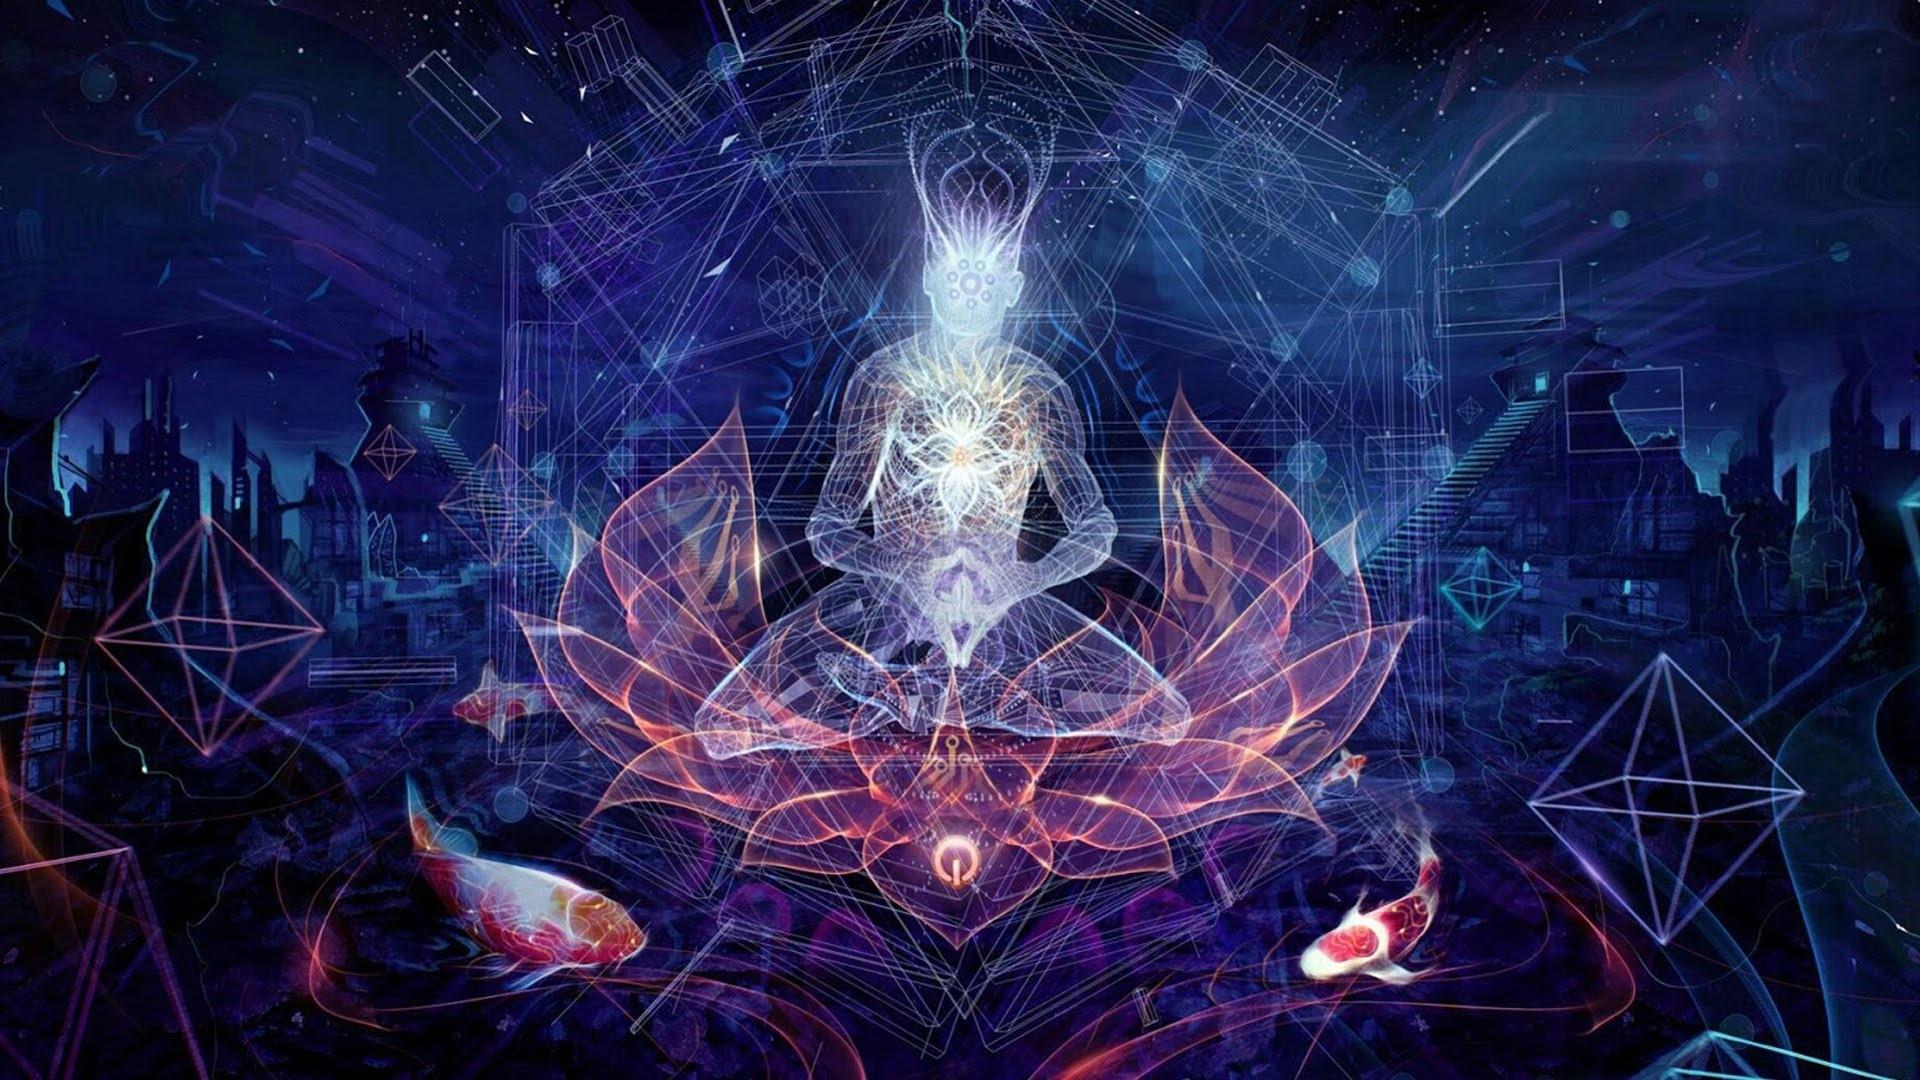 Enlightenment best picture